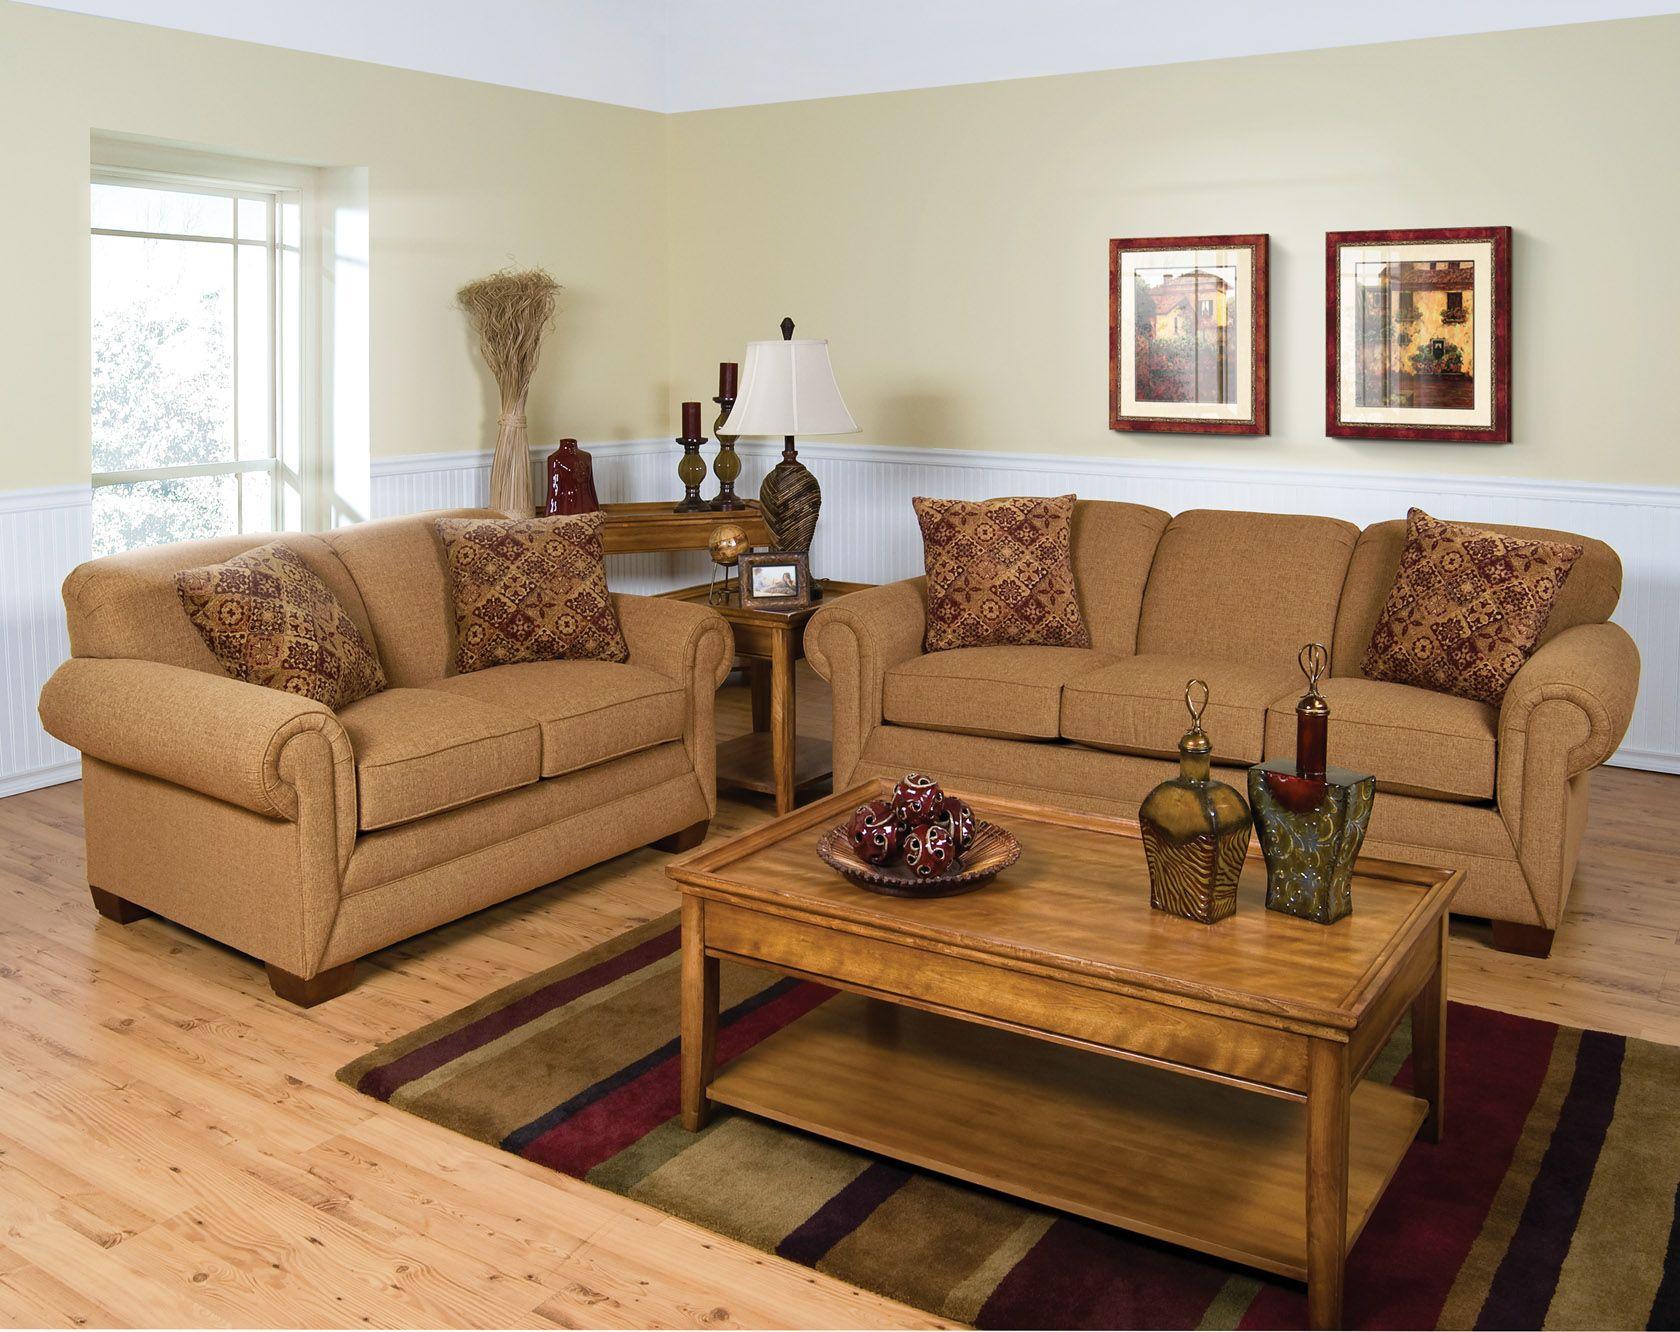 England Furniture 1430 with Impasto Camel and Fiori Amber fabrics